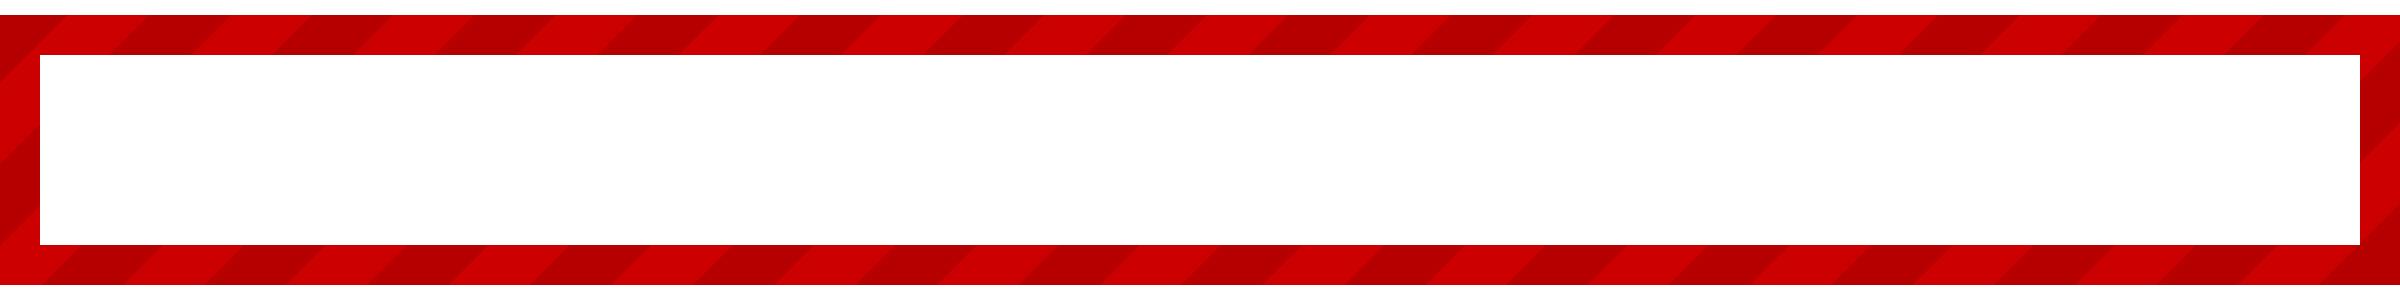 Company Logo : Graphic Tees : Target